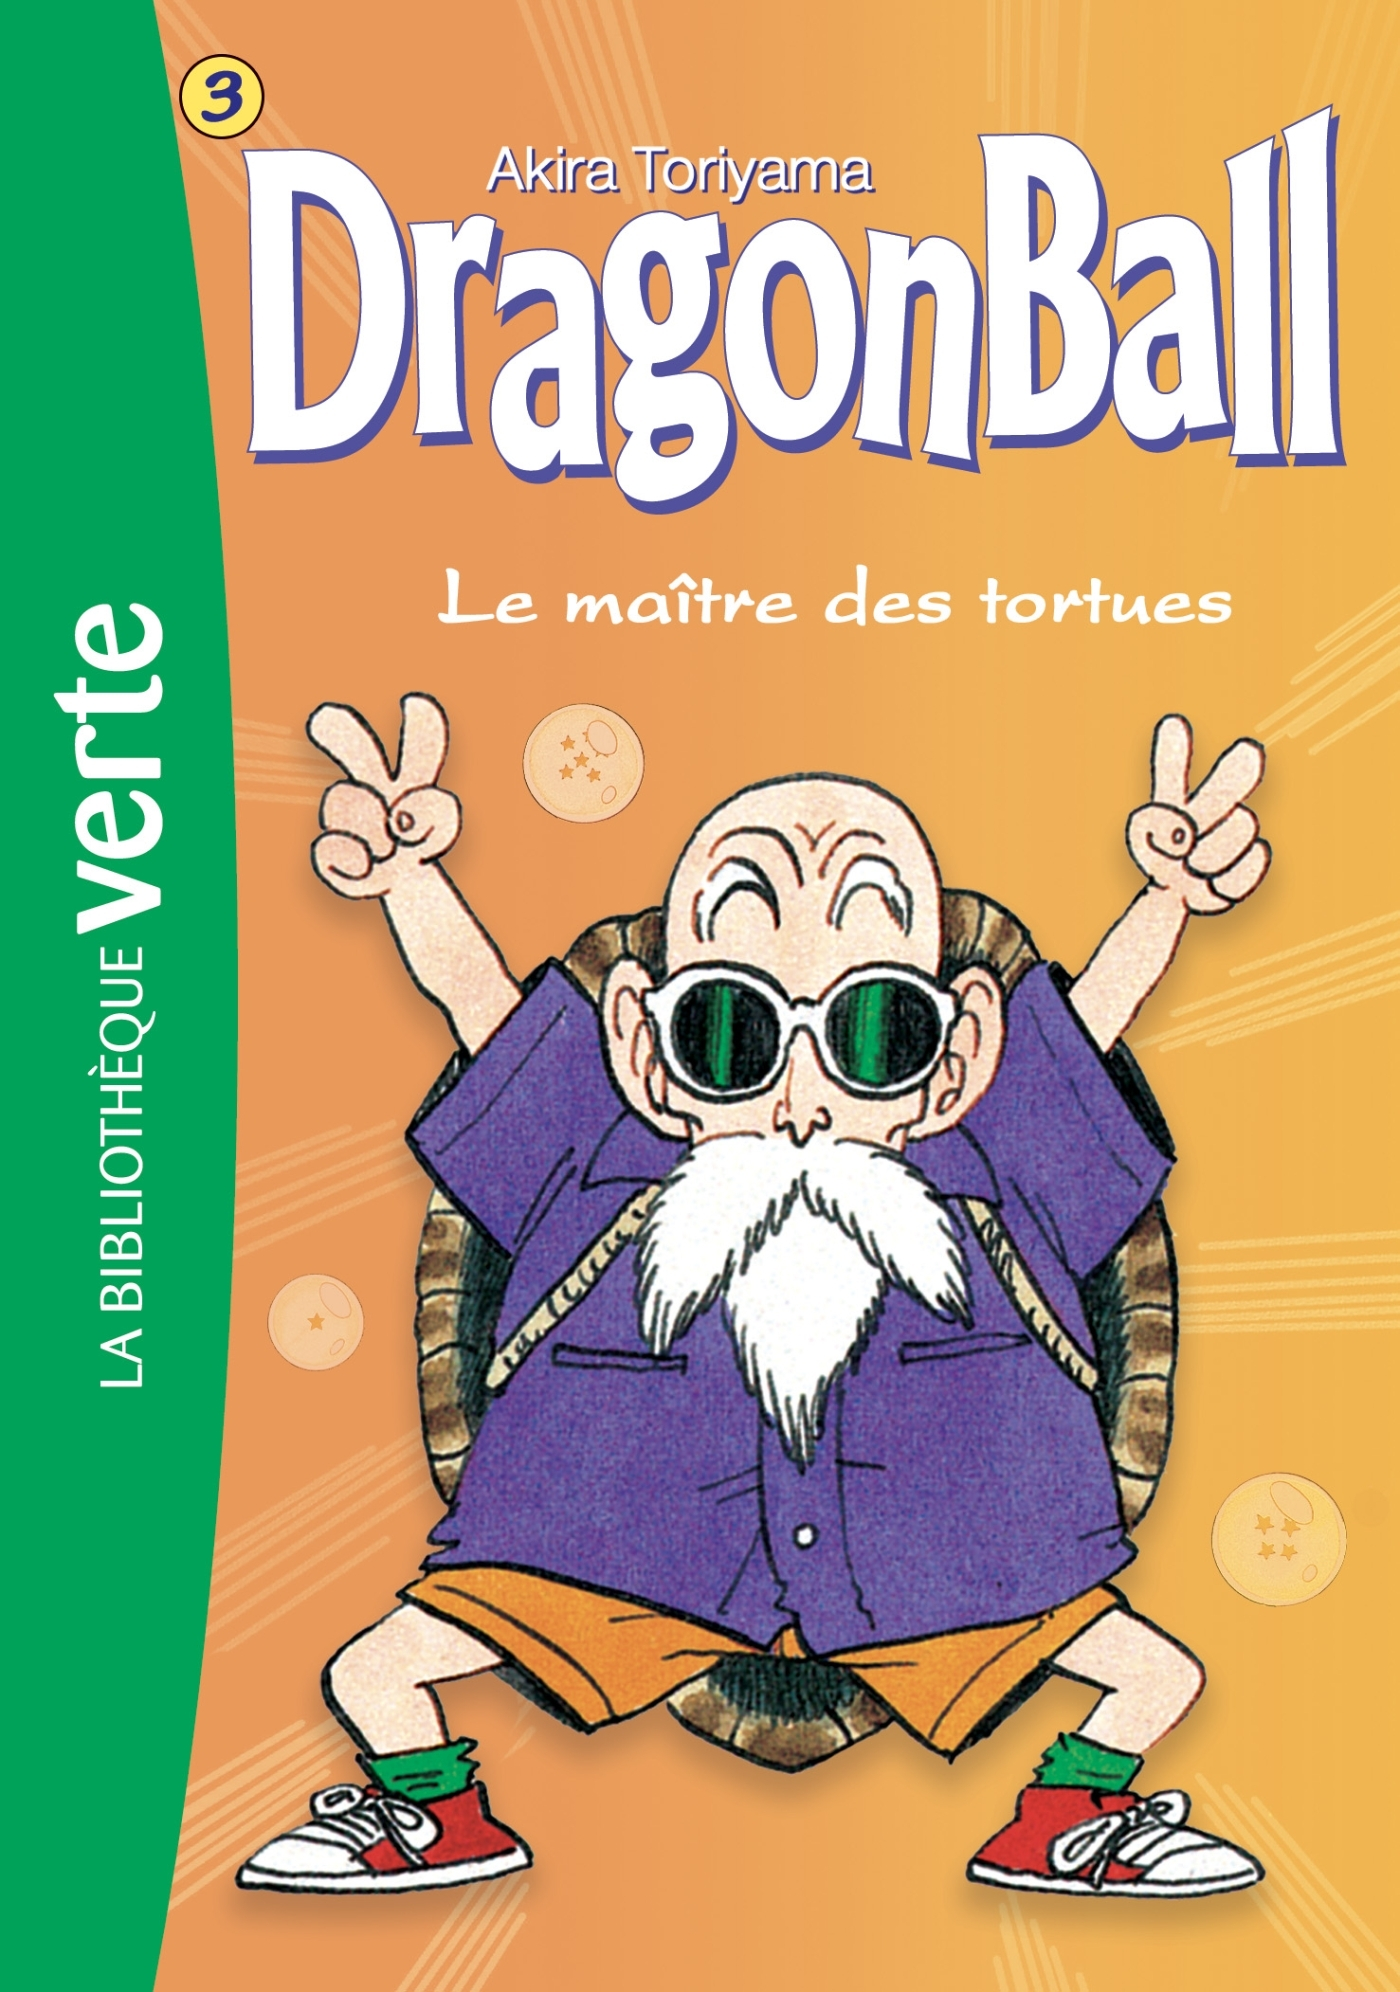 DRAGON BALL 03 NED 2018 - LE MAITRE DES TORTUES